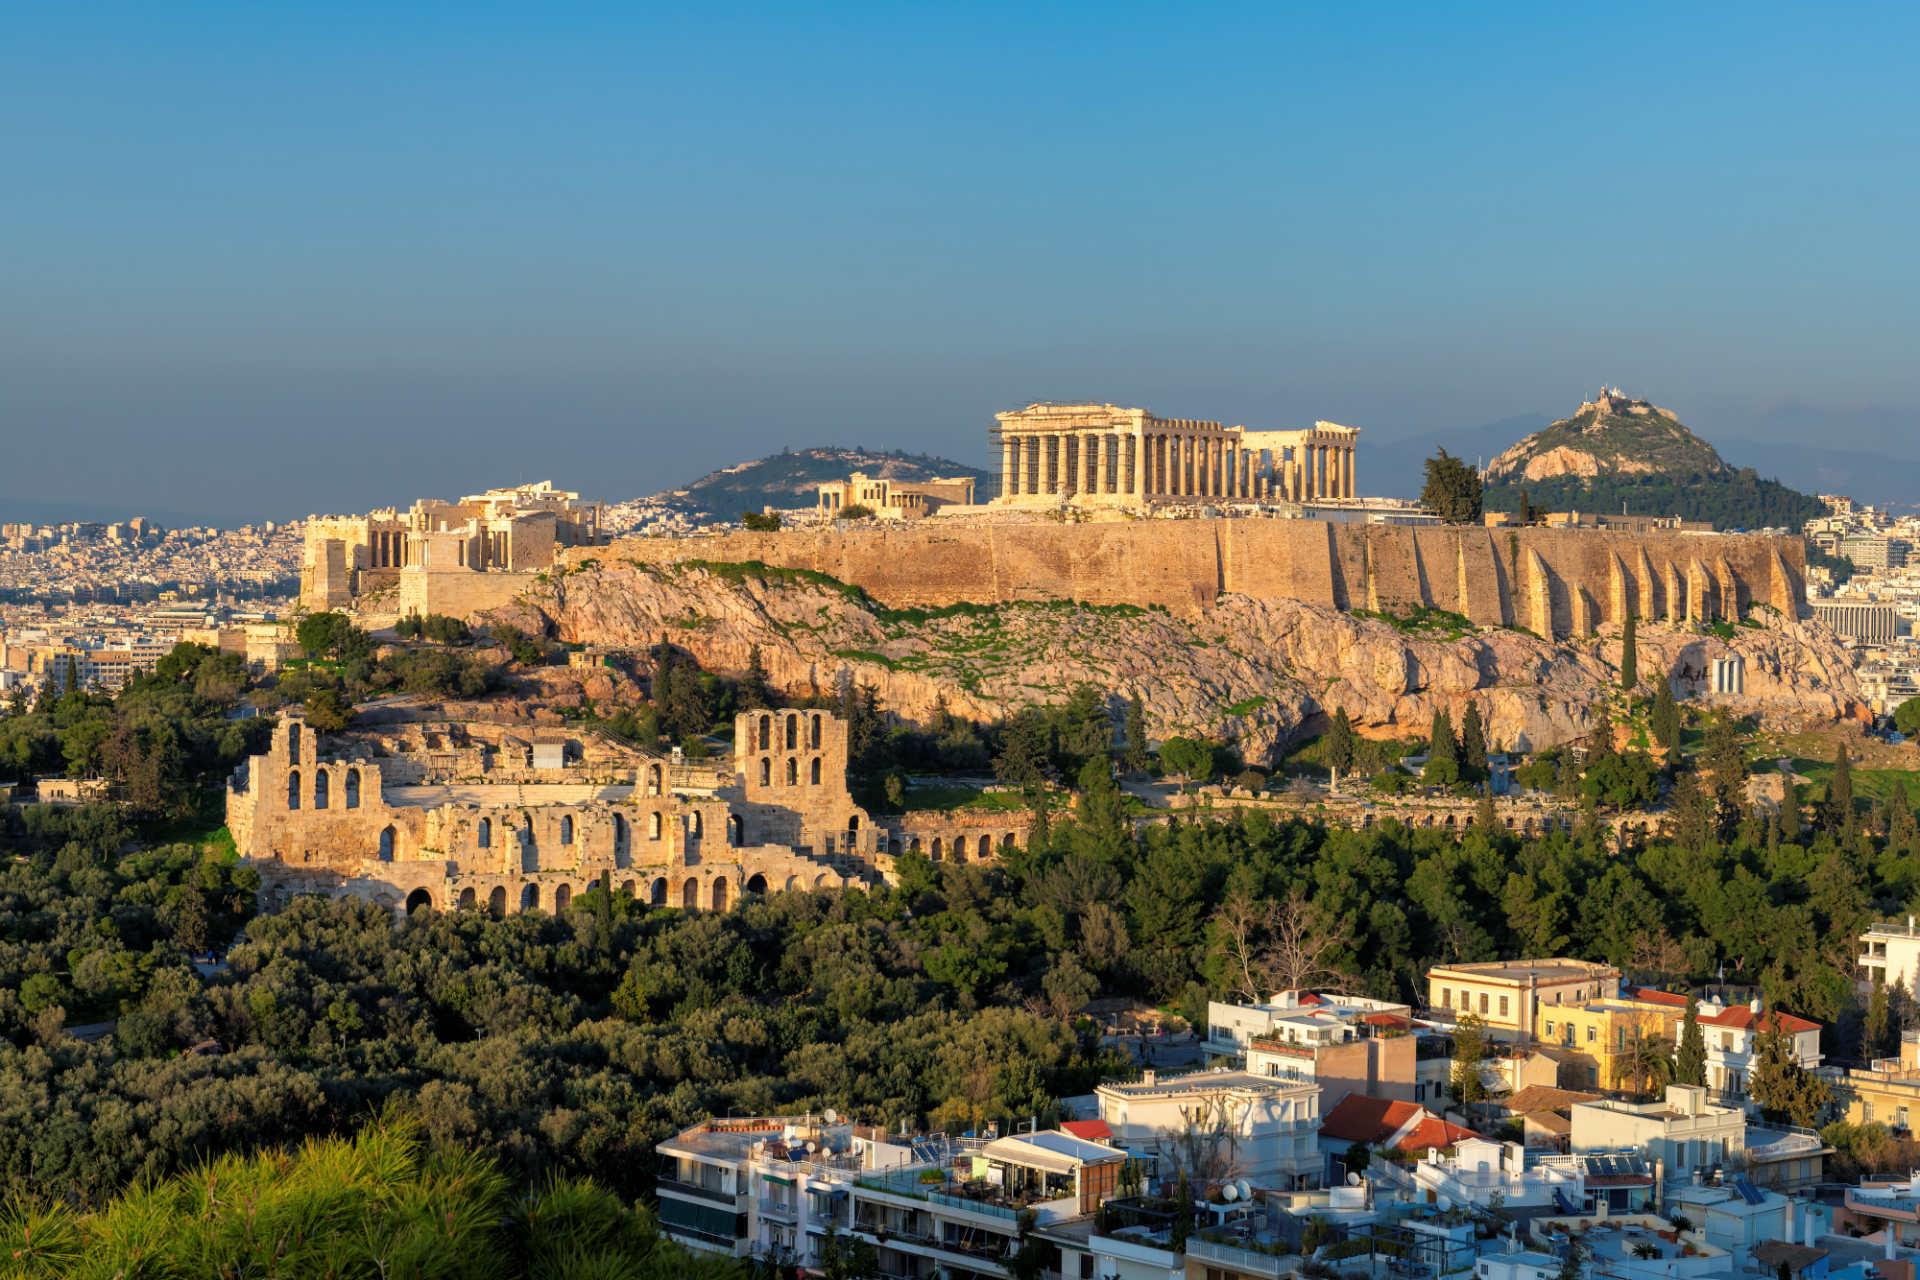 acropolis-parthenon-athens-greece-shutterstock_1339495853.jpg